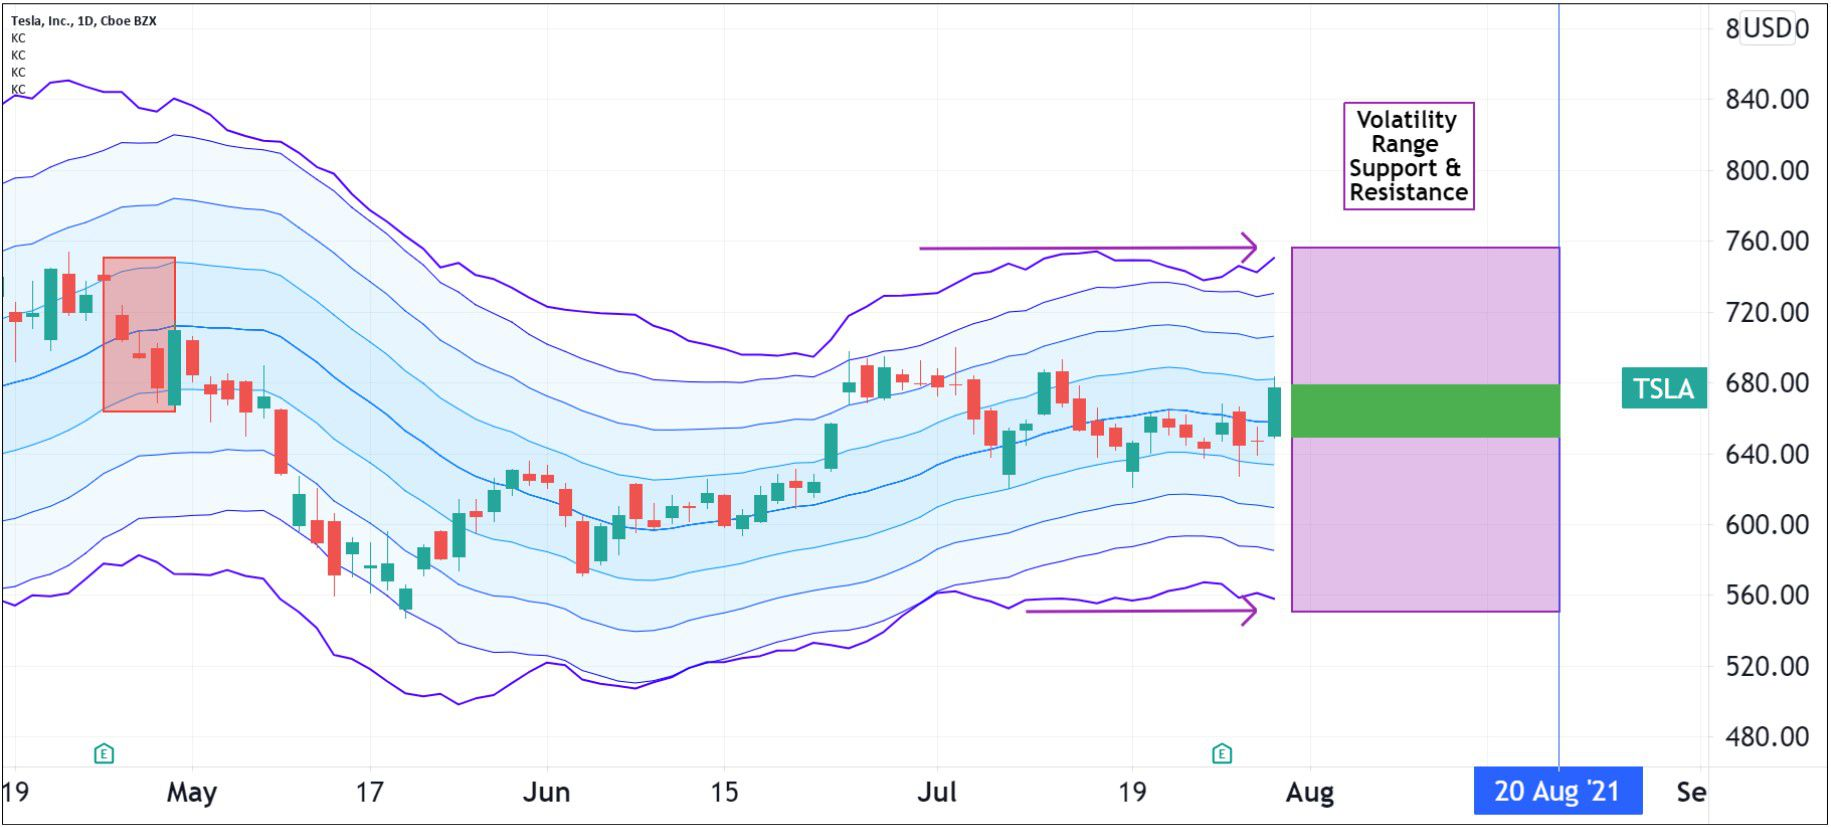 Volatility pattern for Tesla (TSLA)